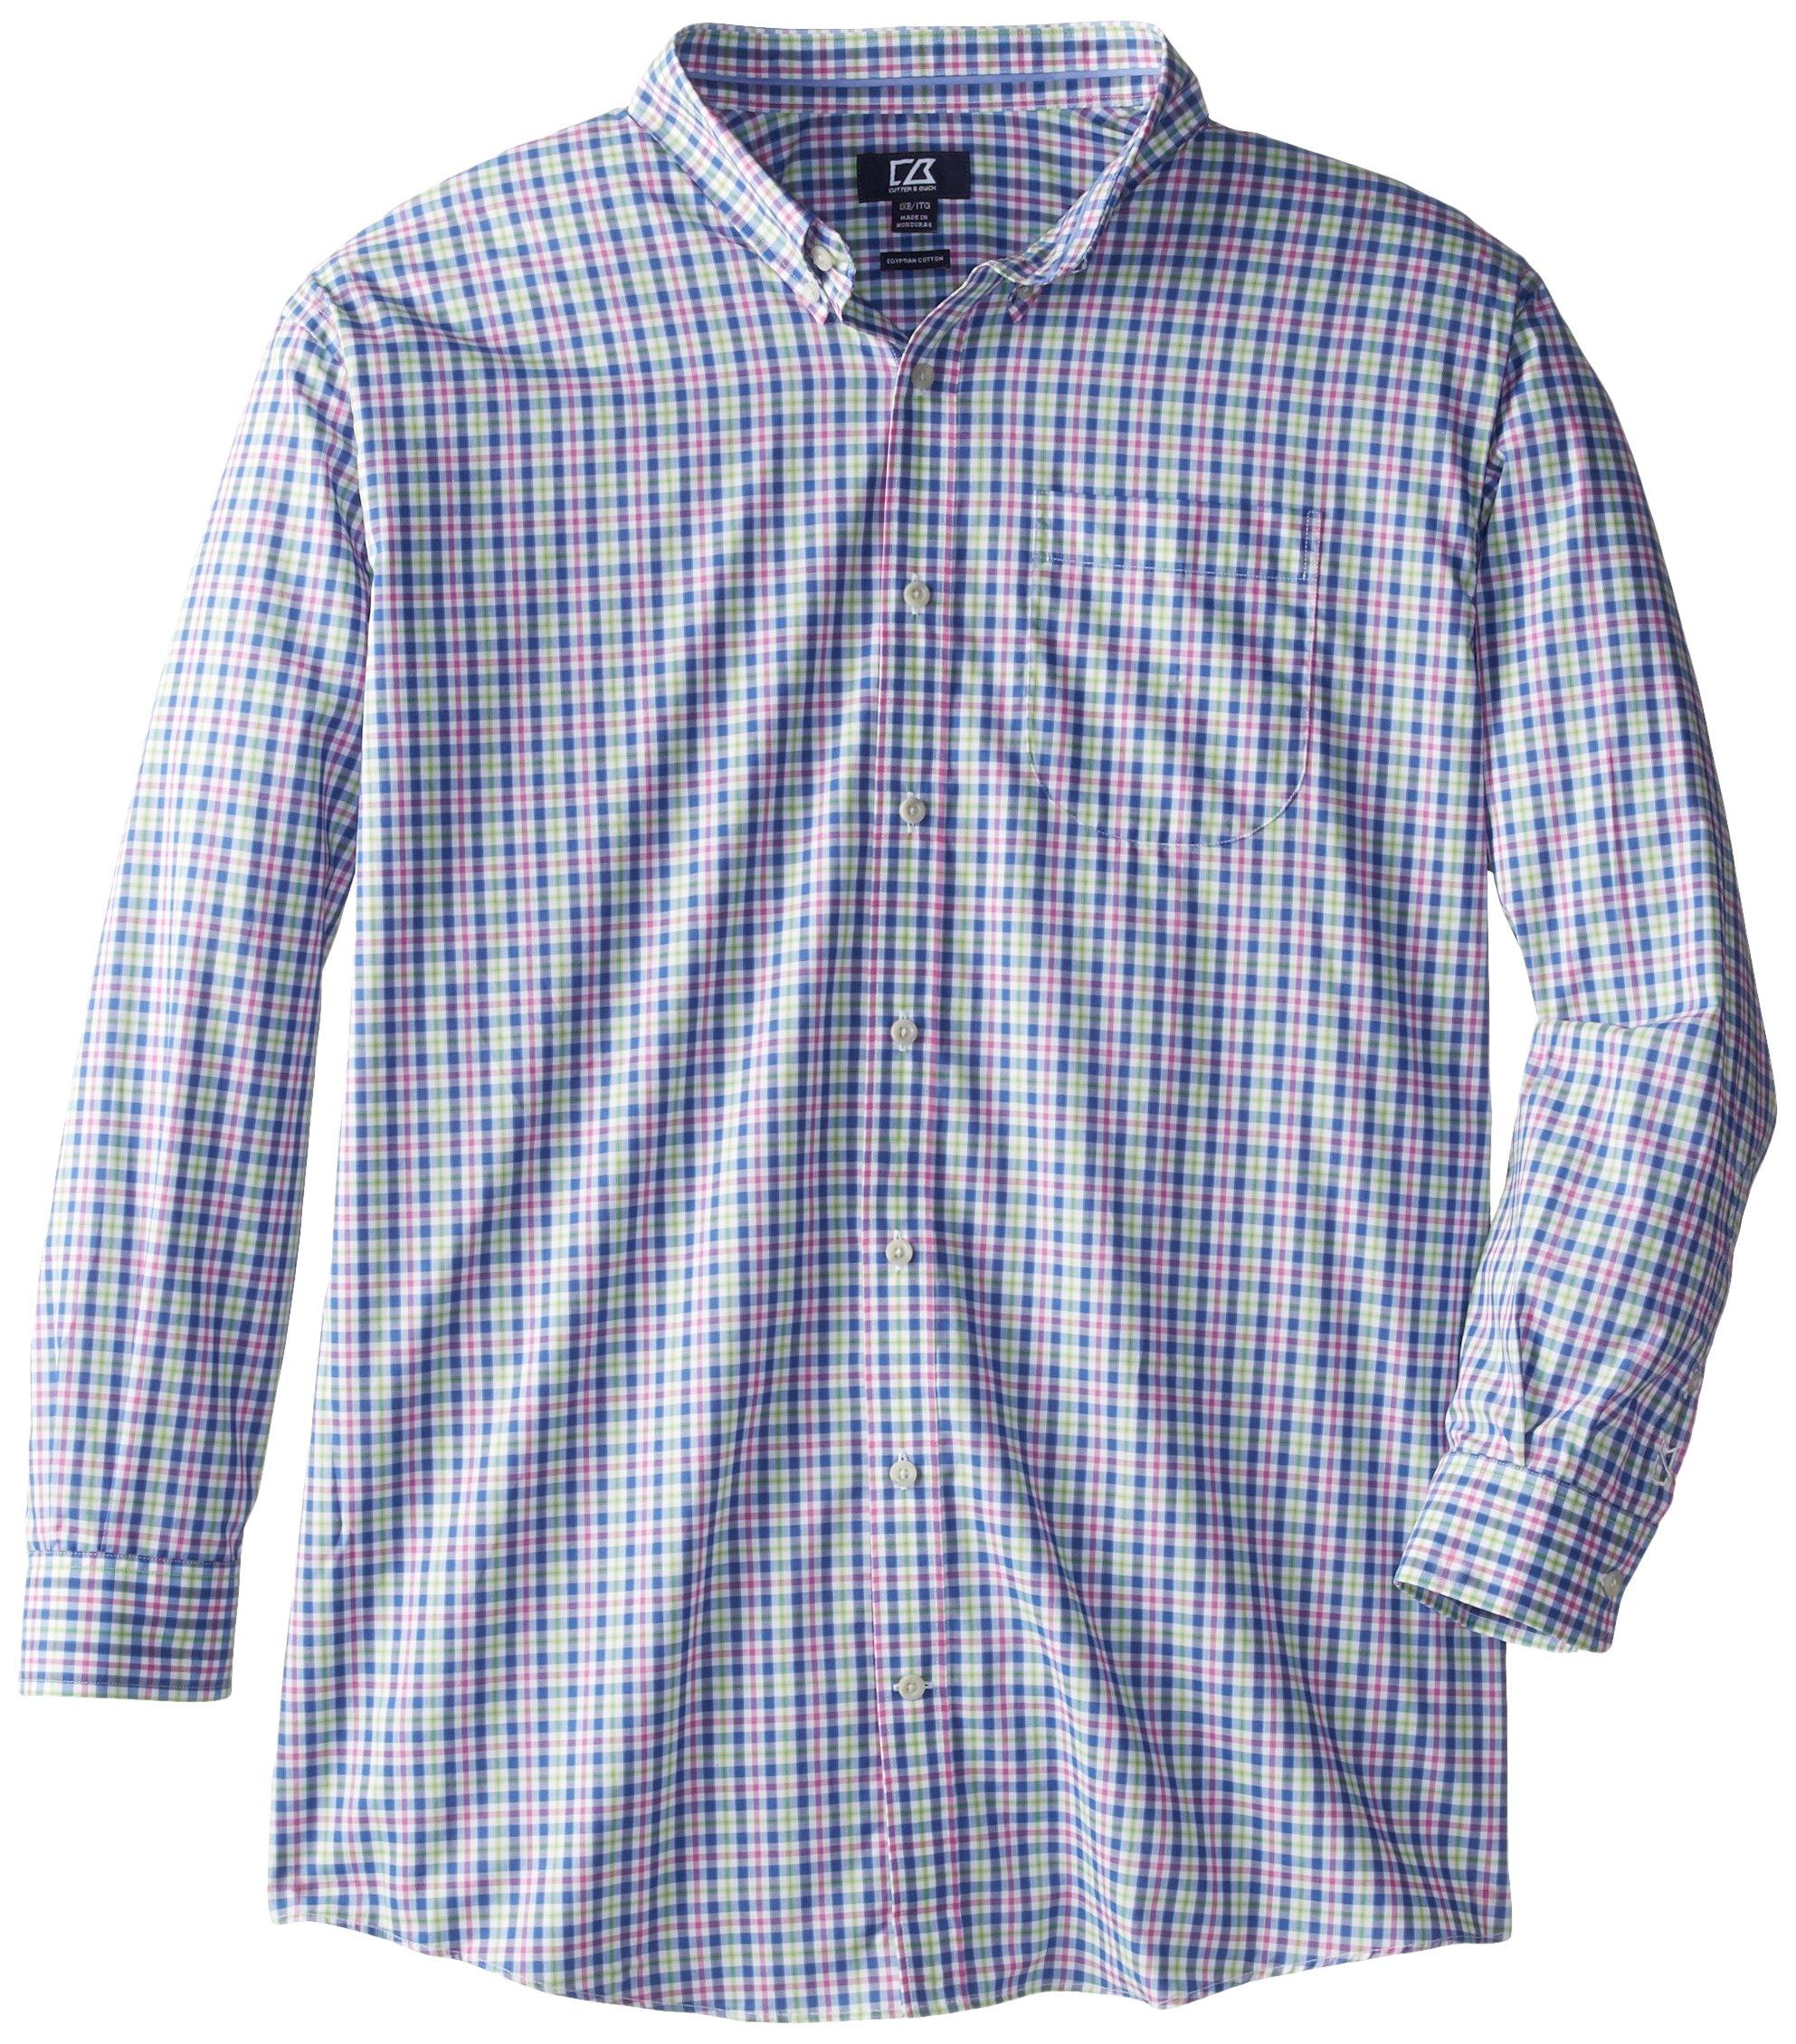 Cutter & Buck Men's Big-Tall Long Sleeve Evergreen Plaid Shirt, Multi, 3X/Big